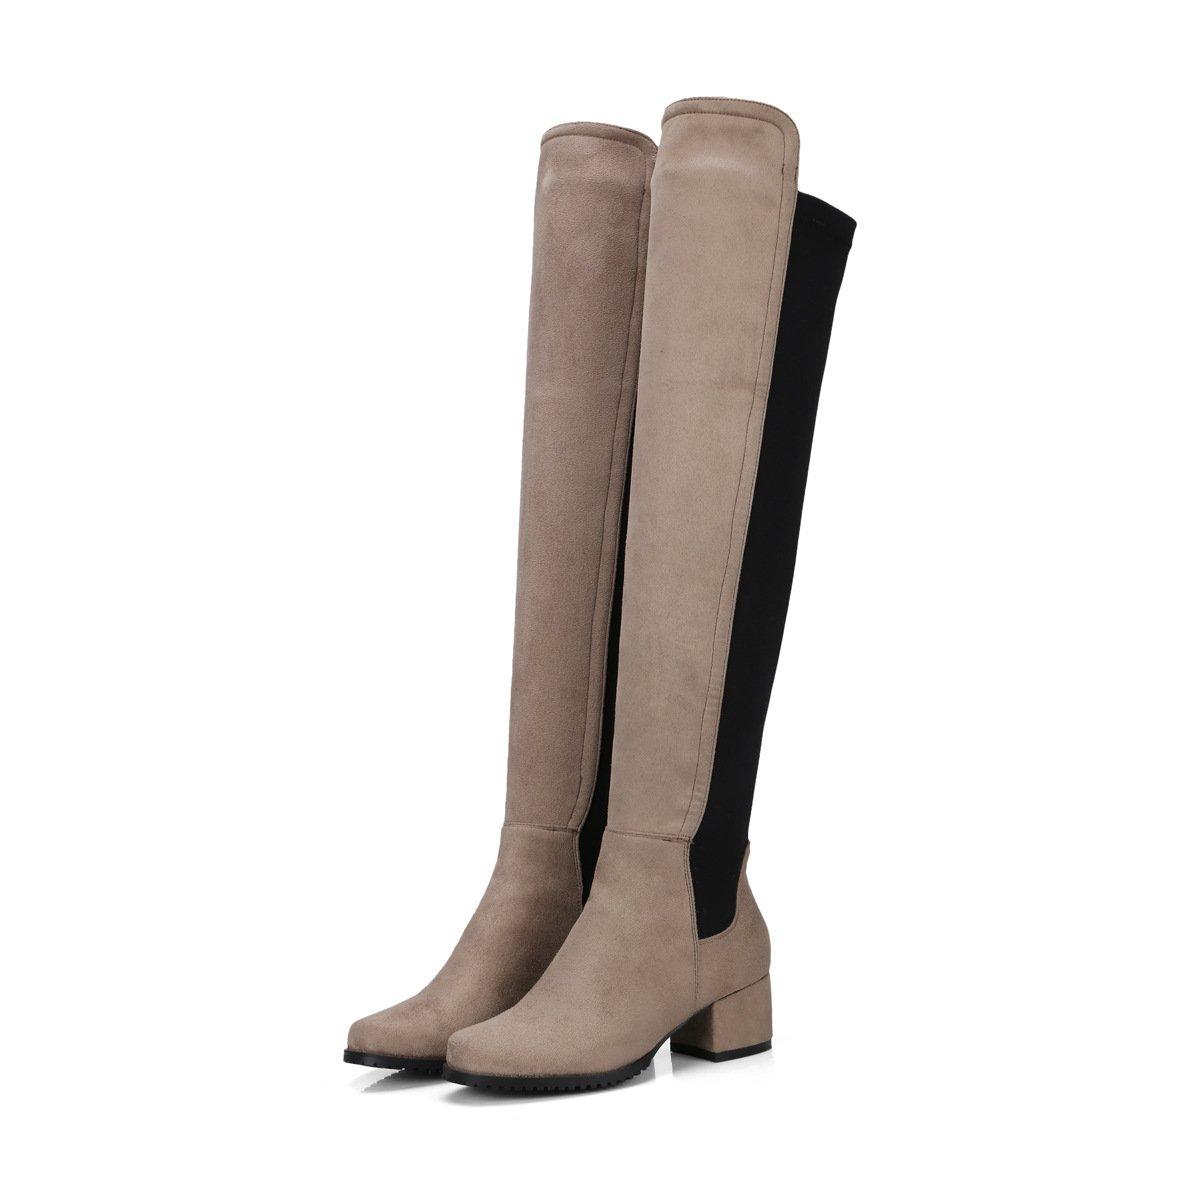 DYF Frauen Schuhe lange Stiefel hohe Faß runden Kopf samt Khaki, Nudeln elastisch, Light Khaki, samt 35 - 164978